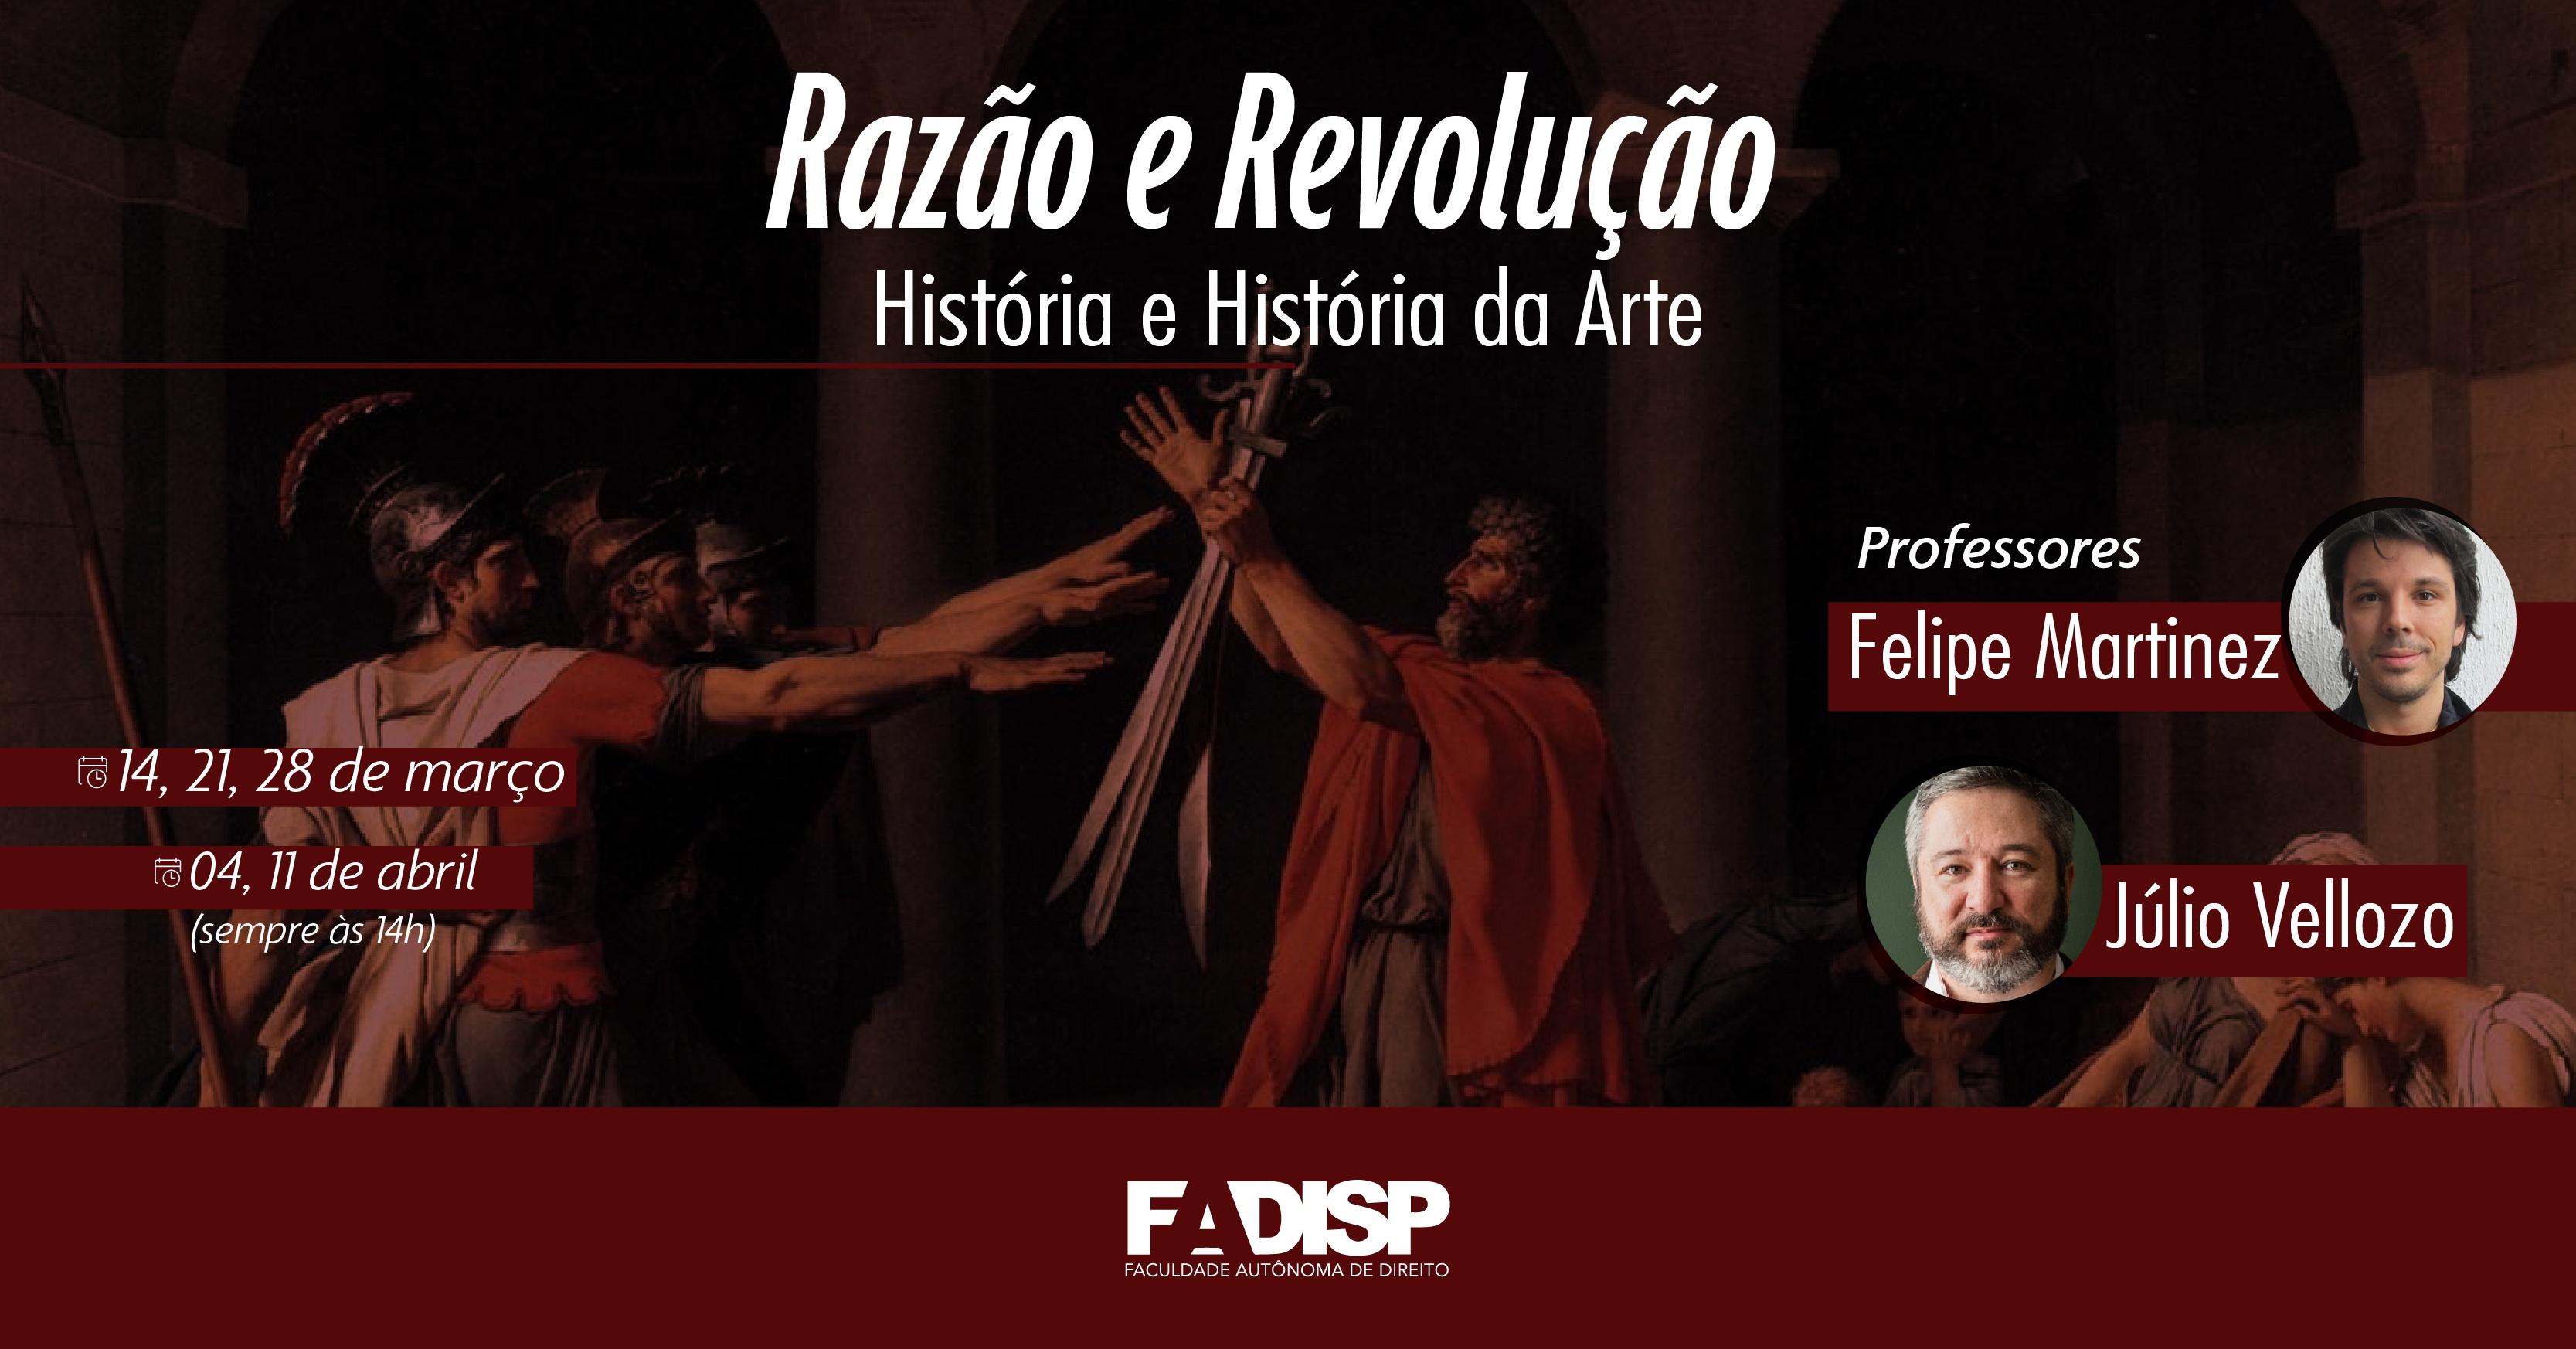 Razao E Revolucao Historia E Historia Da Arte Seculos Xviii E Xix Fadisp Sympla